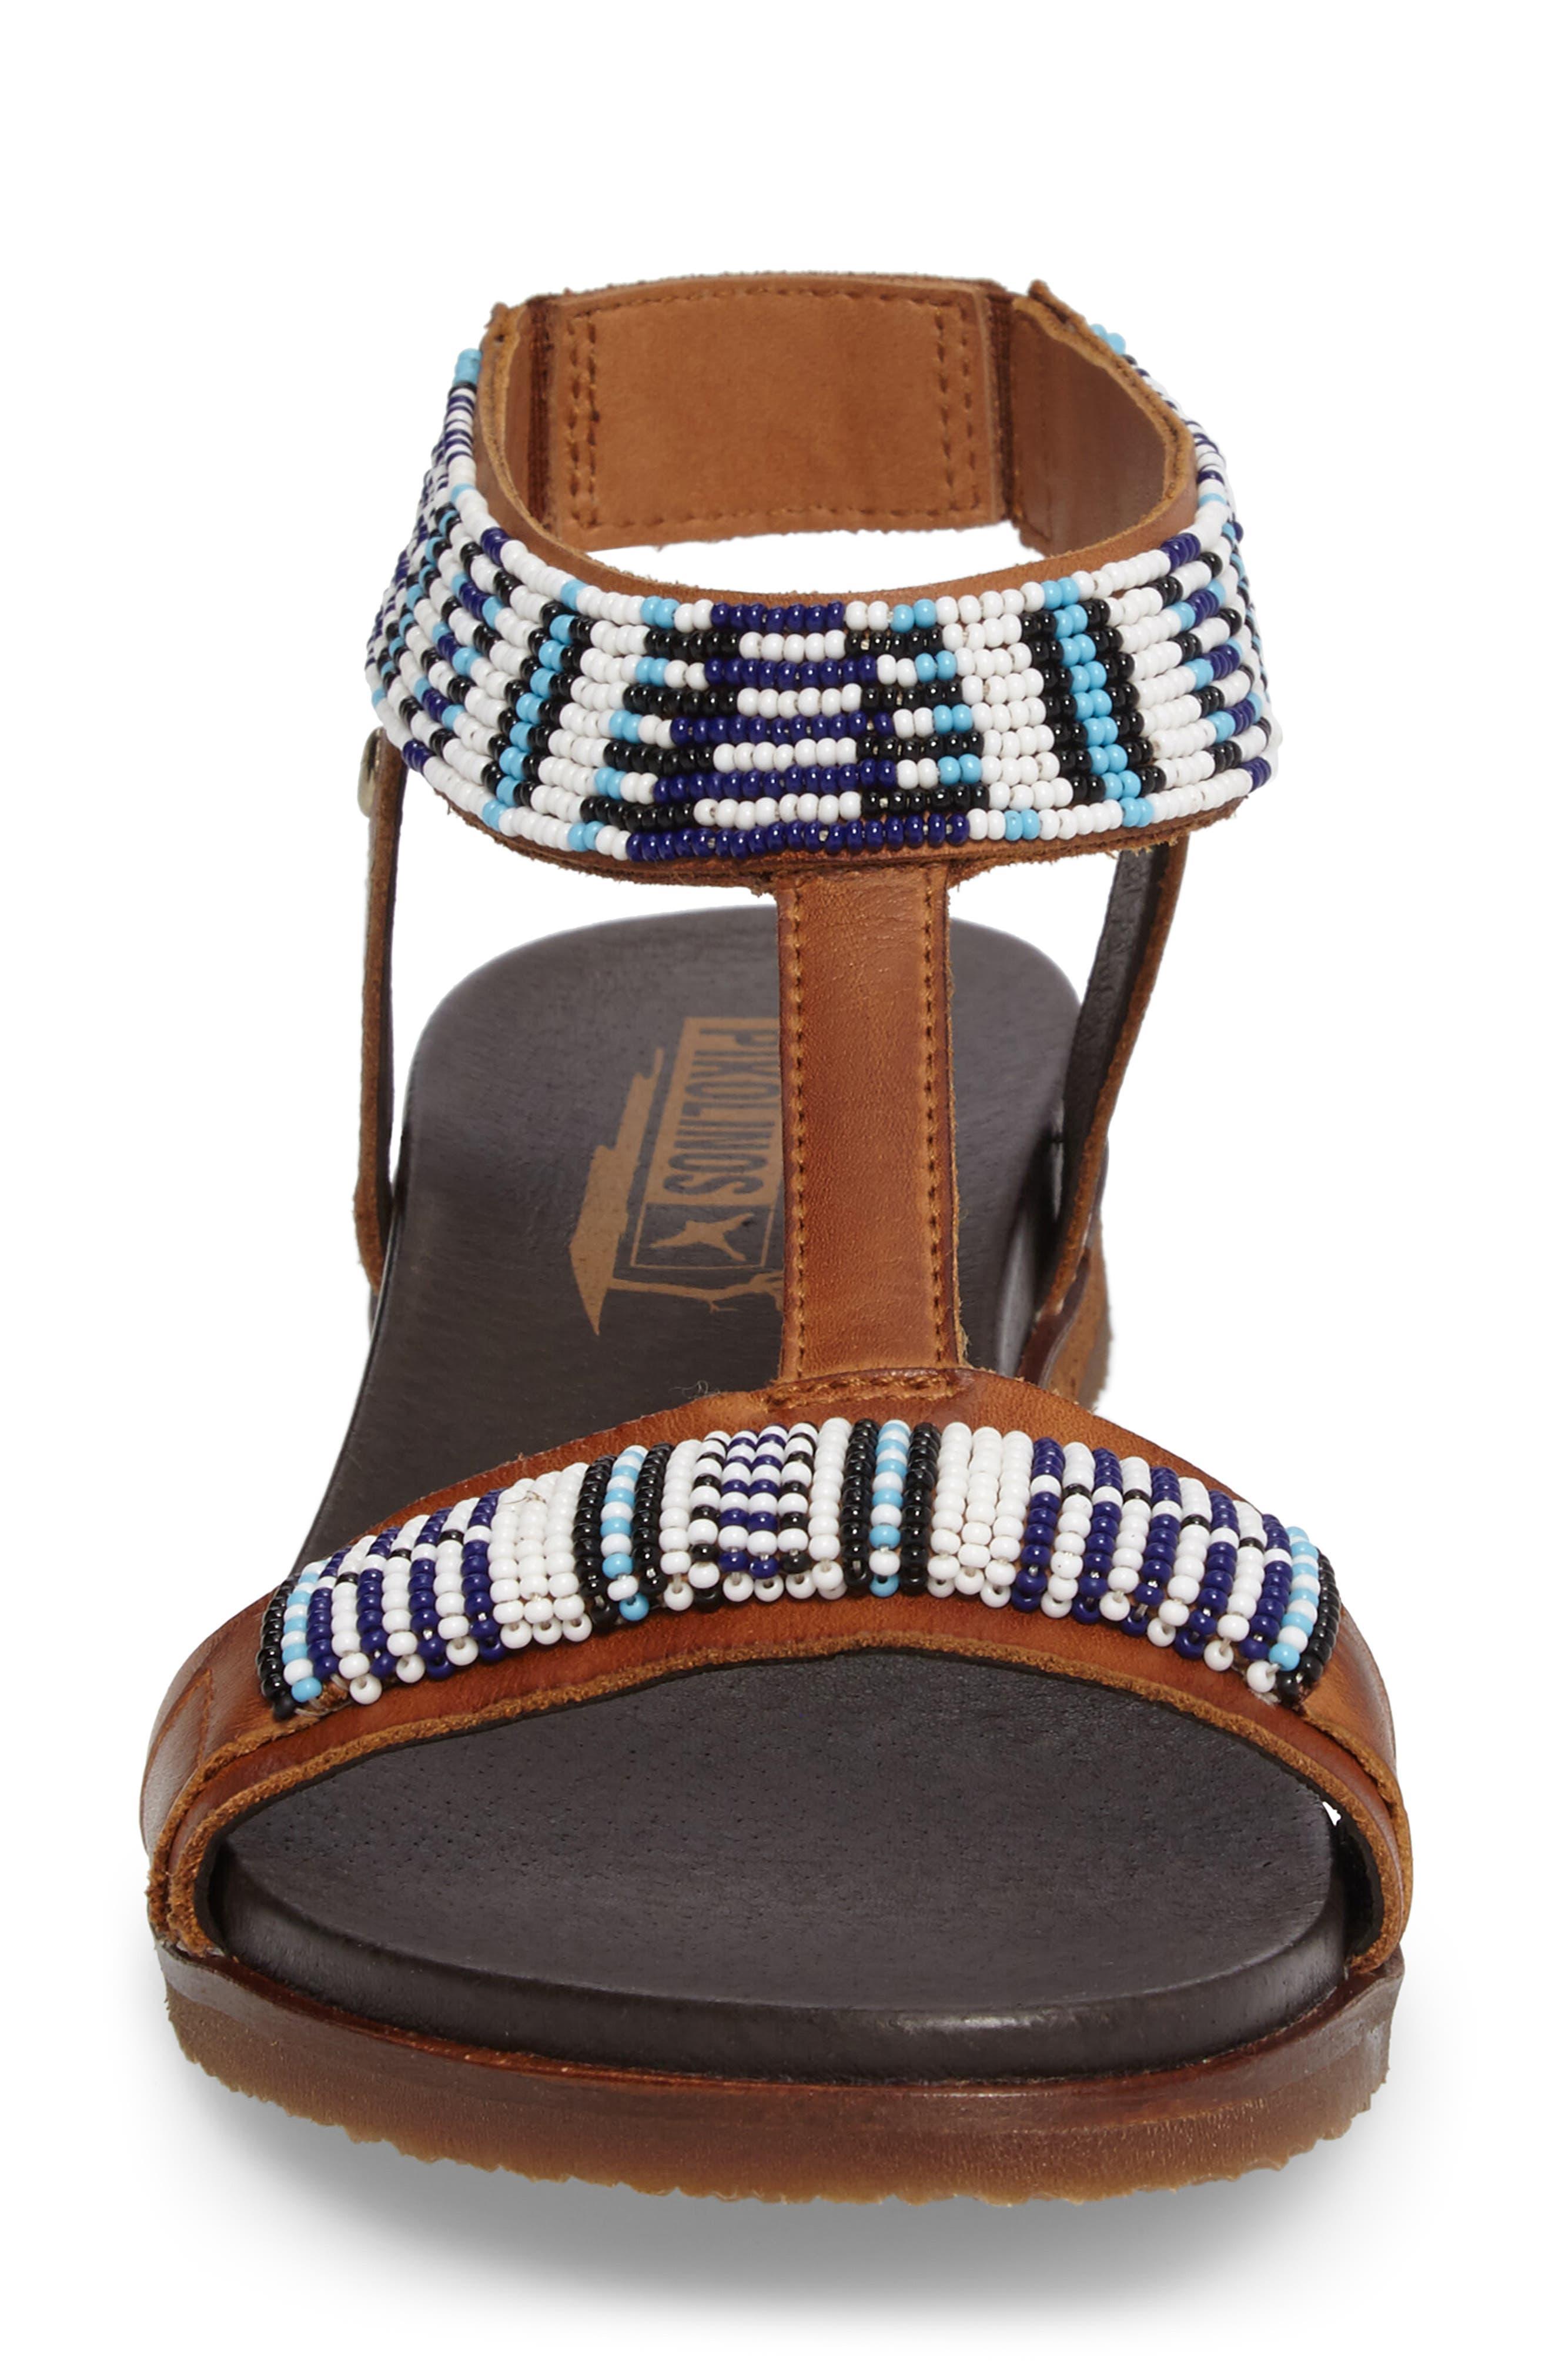 Antillas Beaded Sandal,                             Alternate thumbnail 4, color,                             Brandy Leather